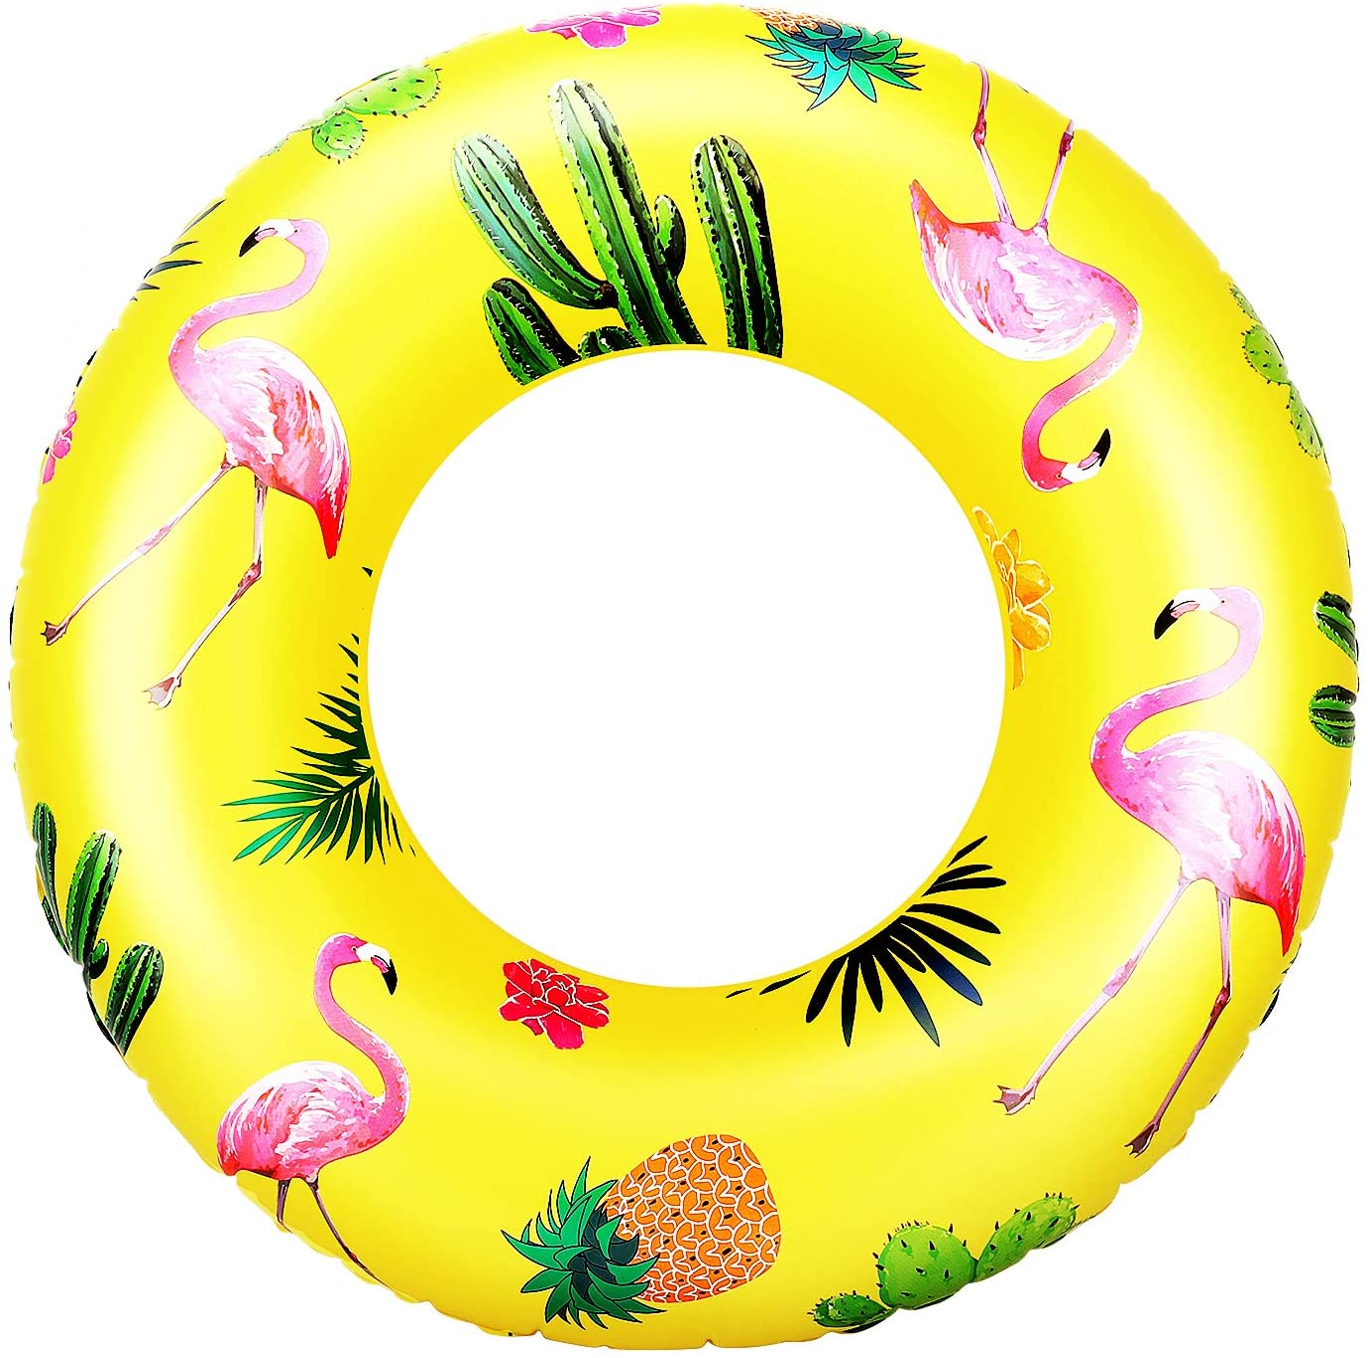 Lowest price challenge HeySplash Cartoon Swim Ring Special price Inflatable Ani Durable Round Shaped